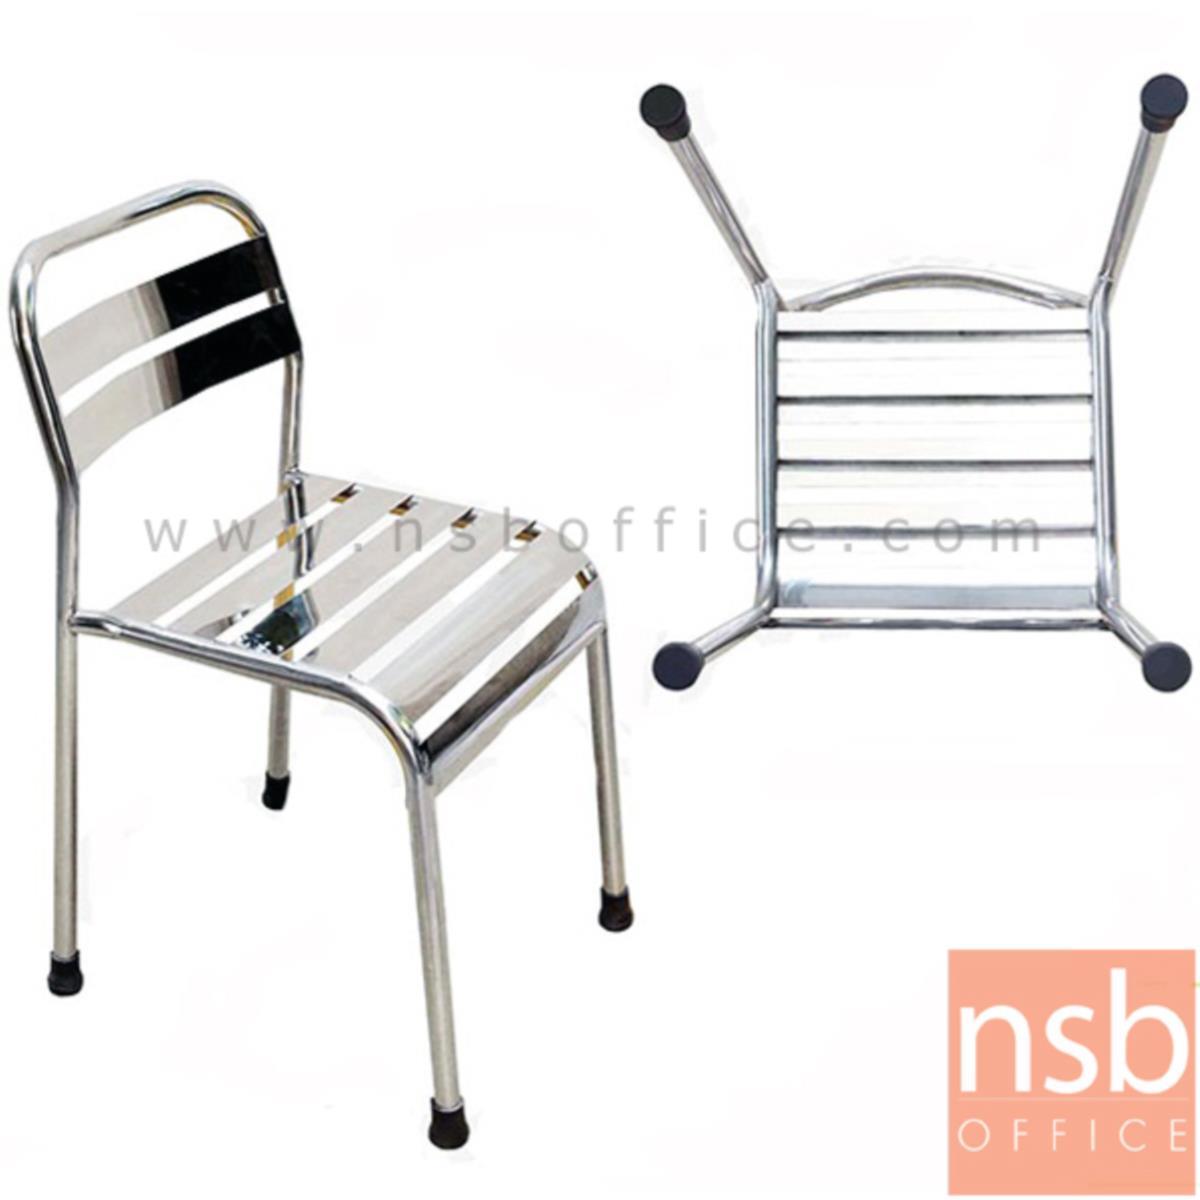 G12A176:เก้าอี้สเตนเลสล้วน ไม่มีท้าวแขน รุ่น KJC-031